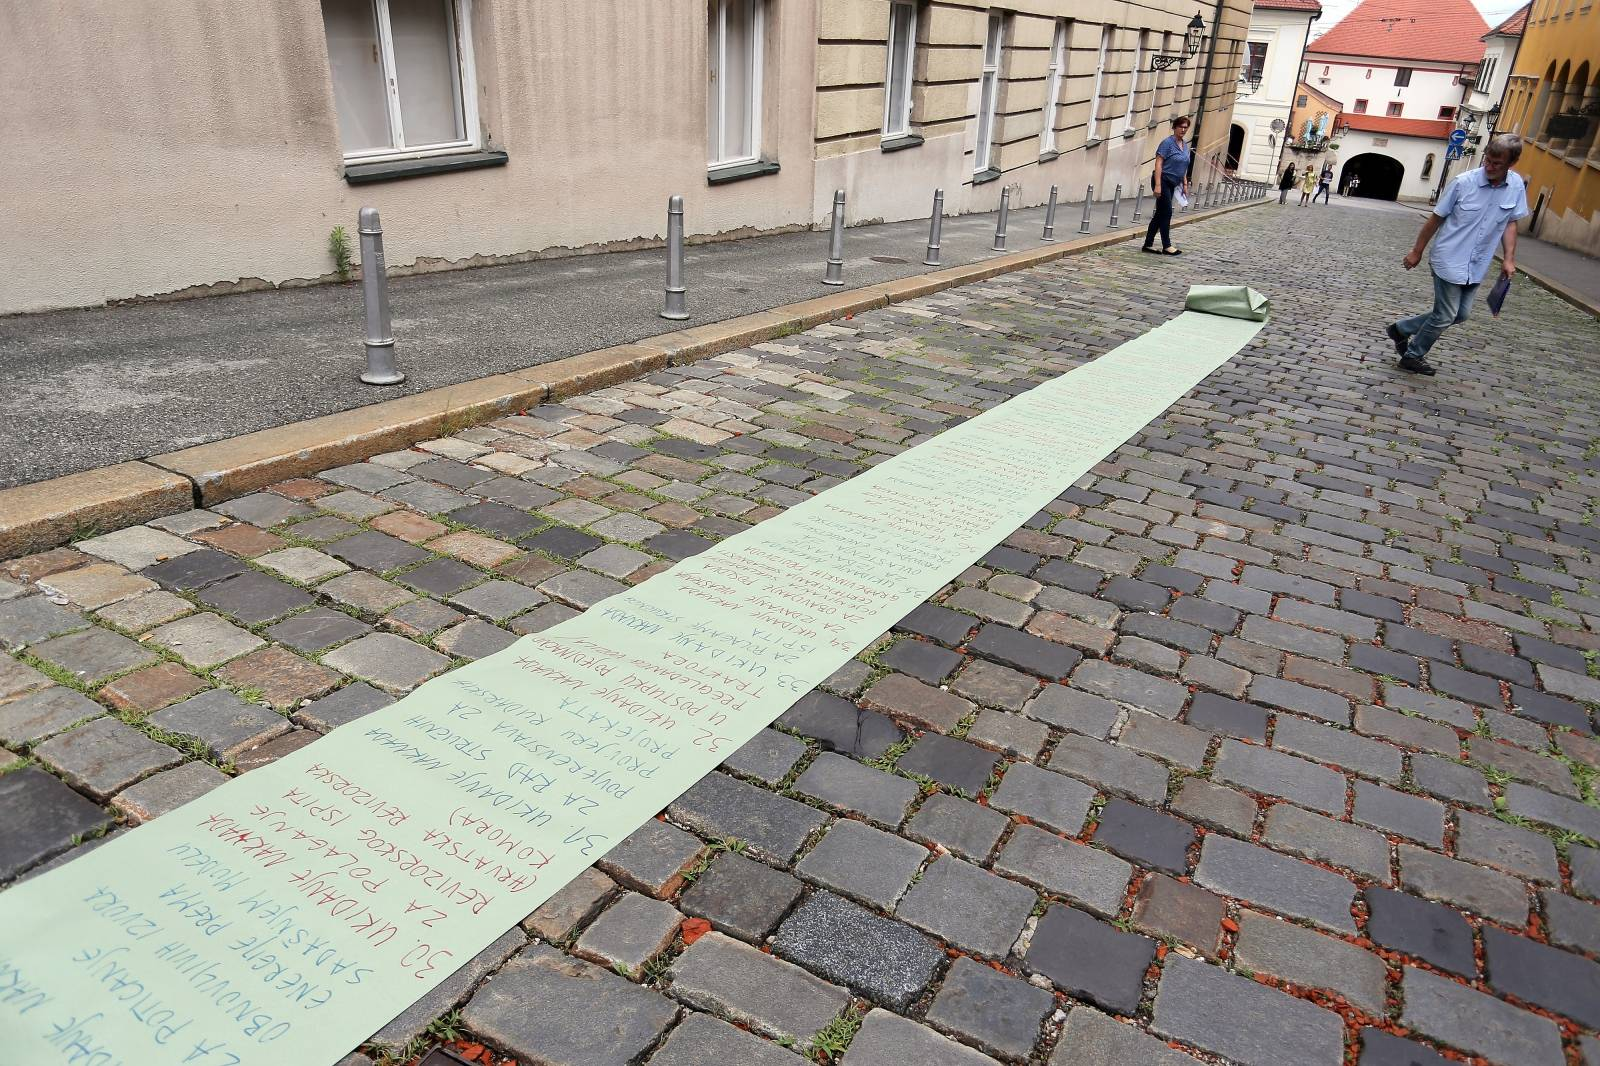 Zagreb: Performans koalicija Stranke s imenom i prezimenom, Pametno i Fokusa